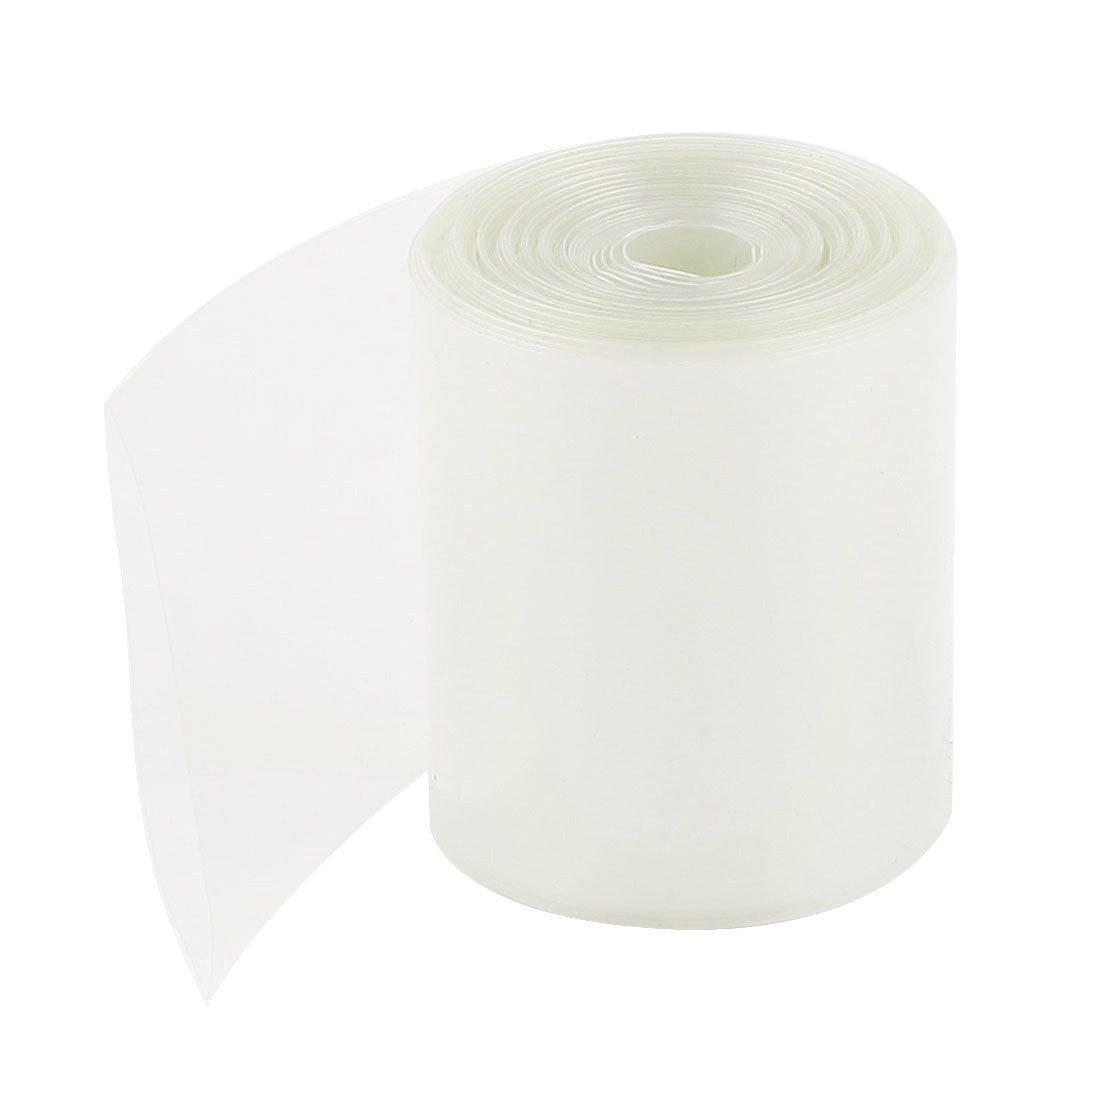 Heat Shrink Tube - SODIAL(R) 50mm Width PVC Heat Shrink Tubing Clear 5Meter for 2 x 18650 Batteries